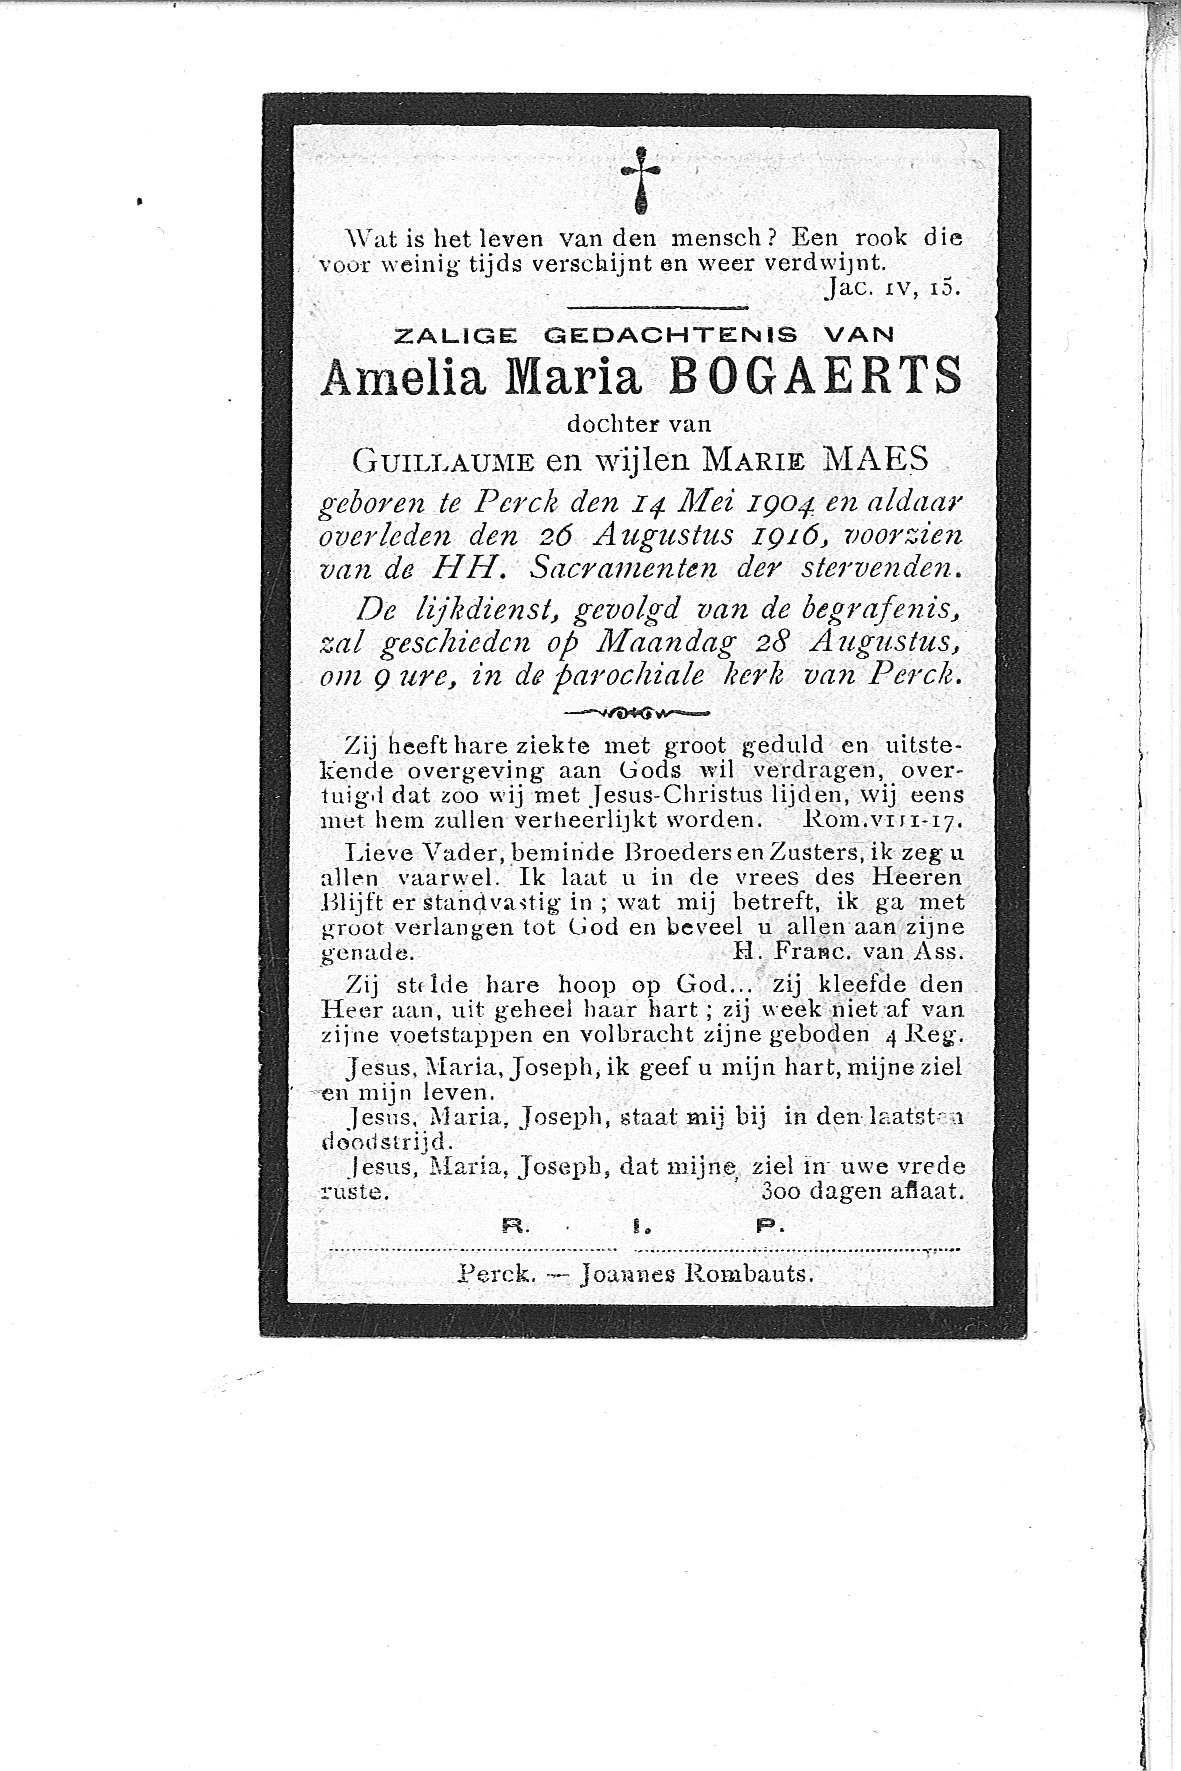 Amelia-Maria(1916)20110317163116_00006.jpg